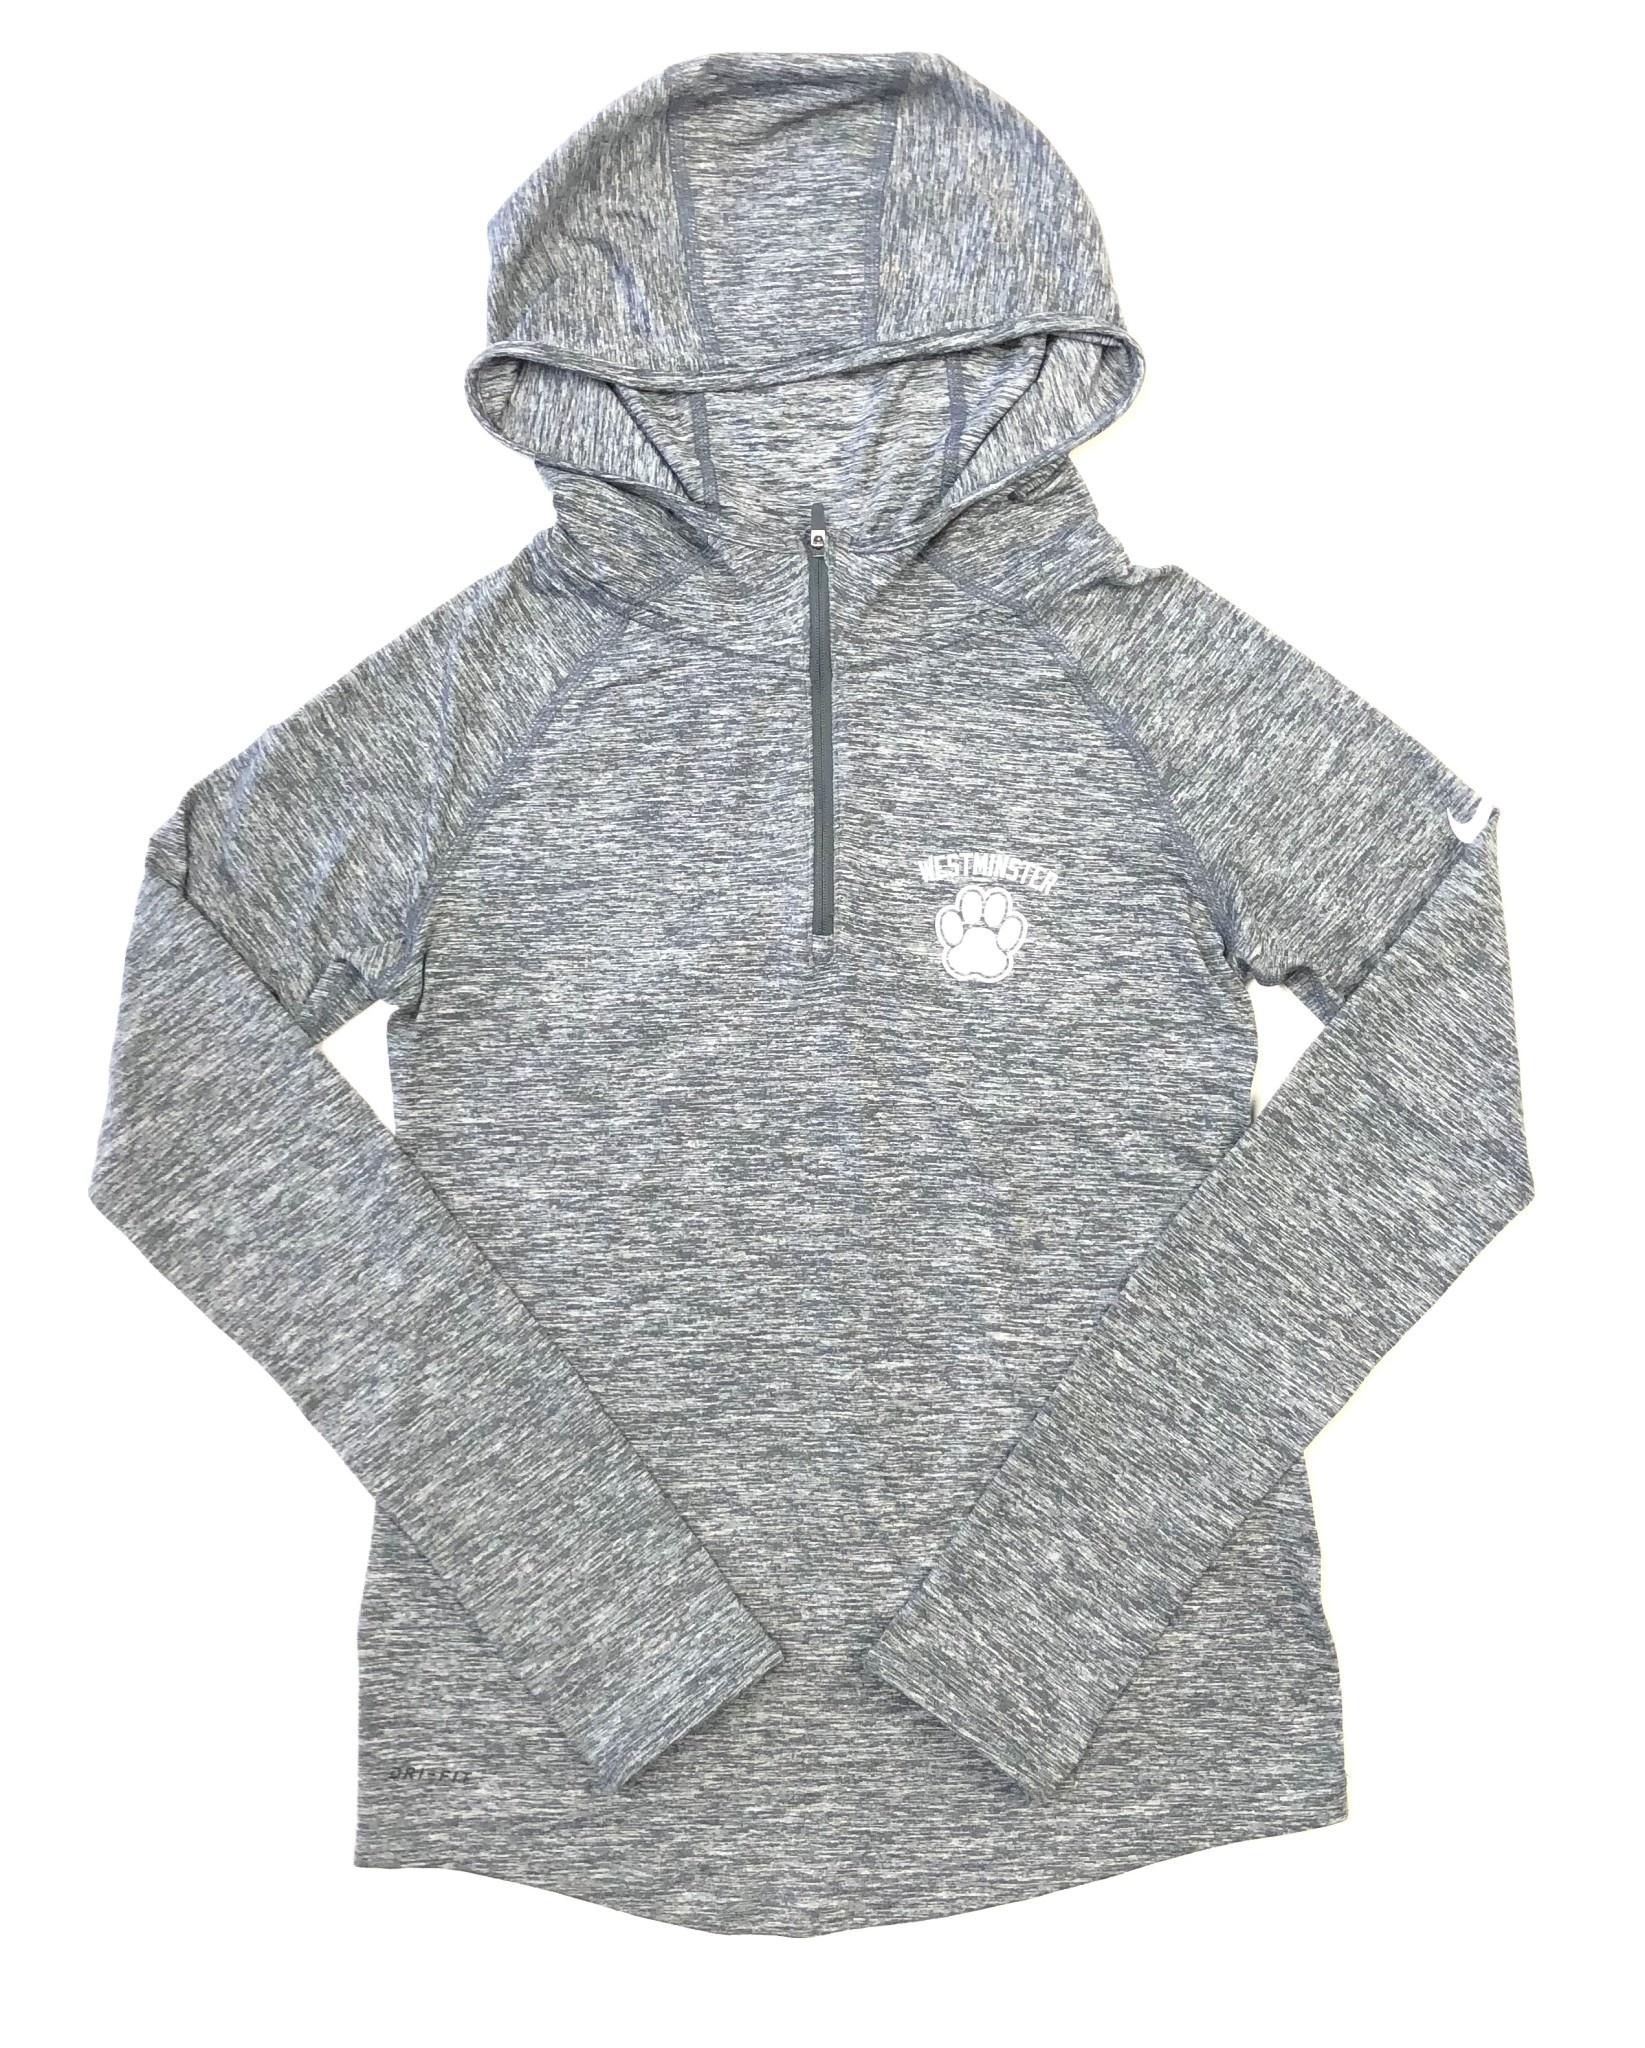 Nike Pullover: Nike Girls 1/4 Zip Hoody Carbon Heather